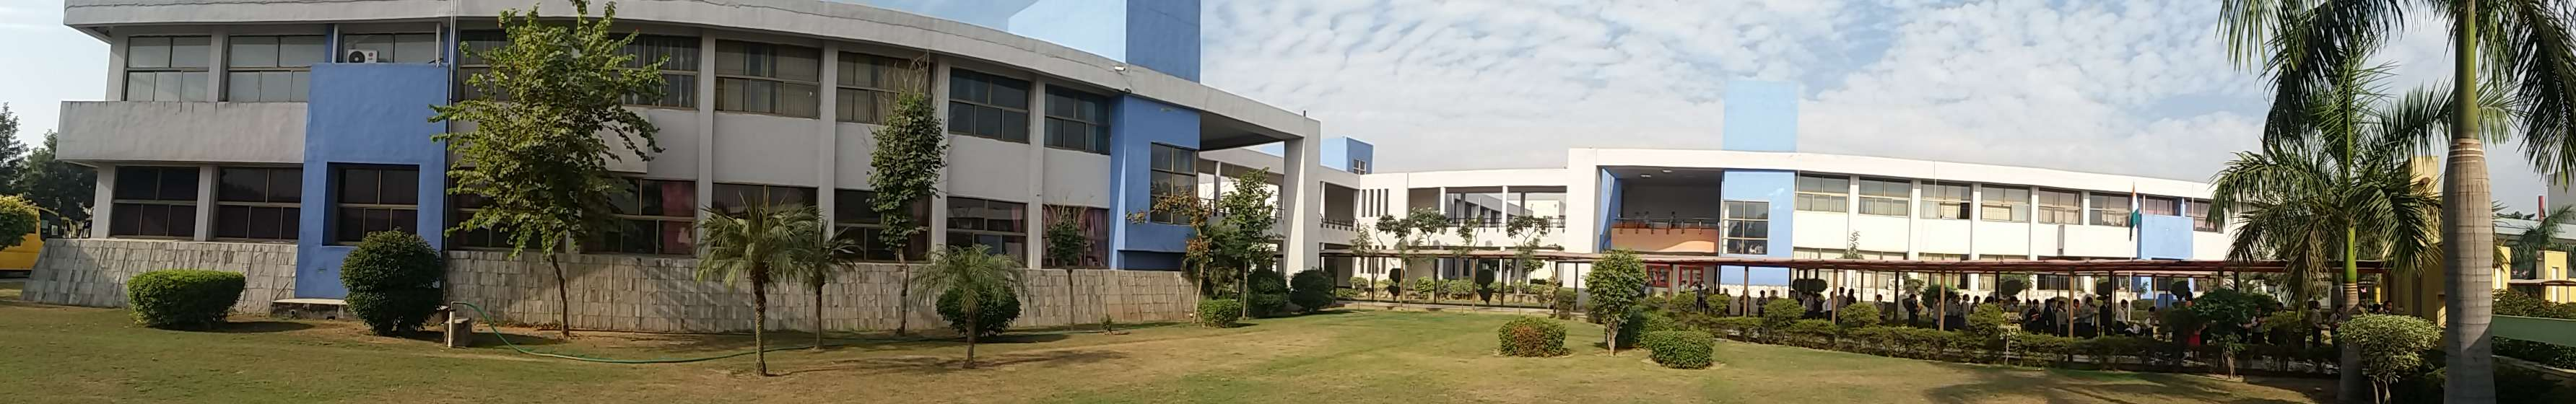 M M International School Mullana M M International SchoolM M Educational ComplexMullana Ambala 530655